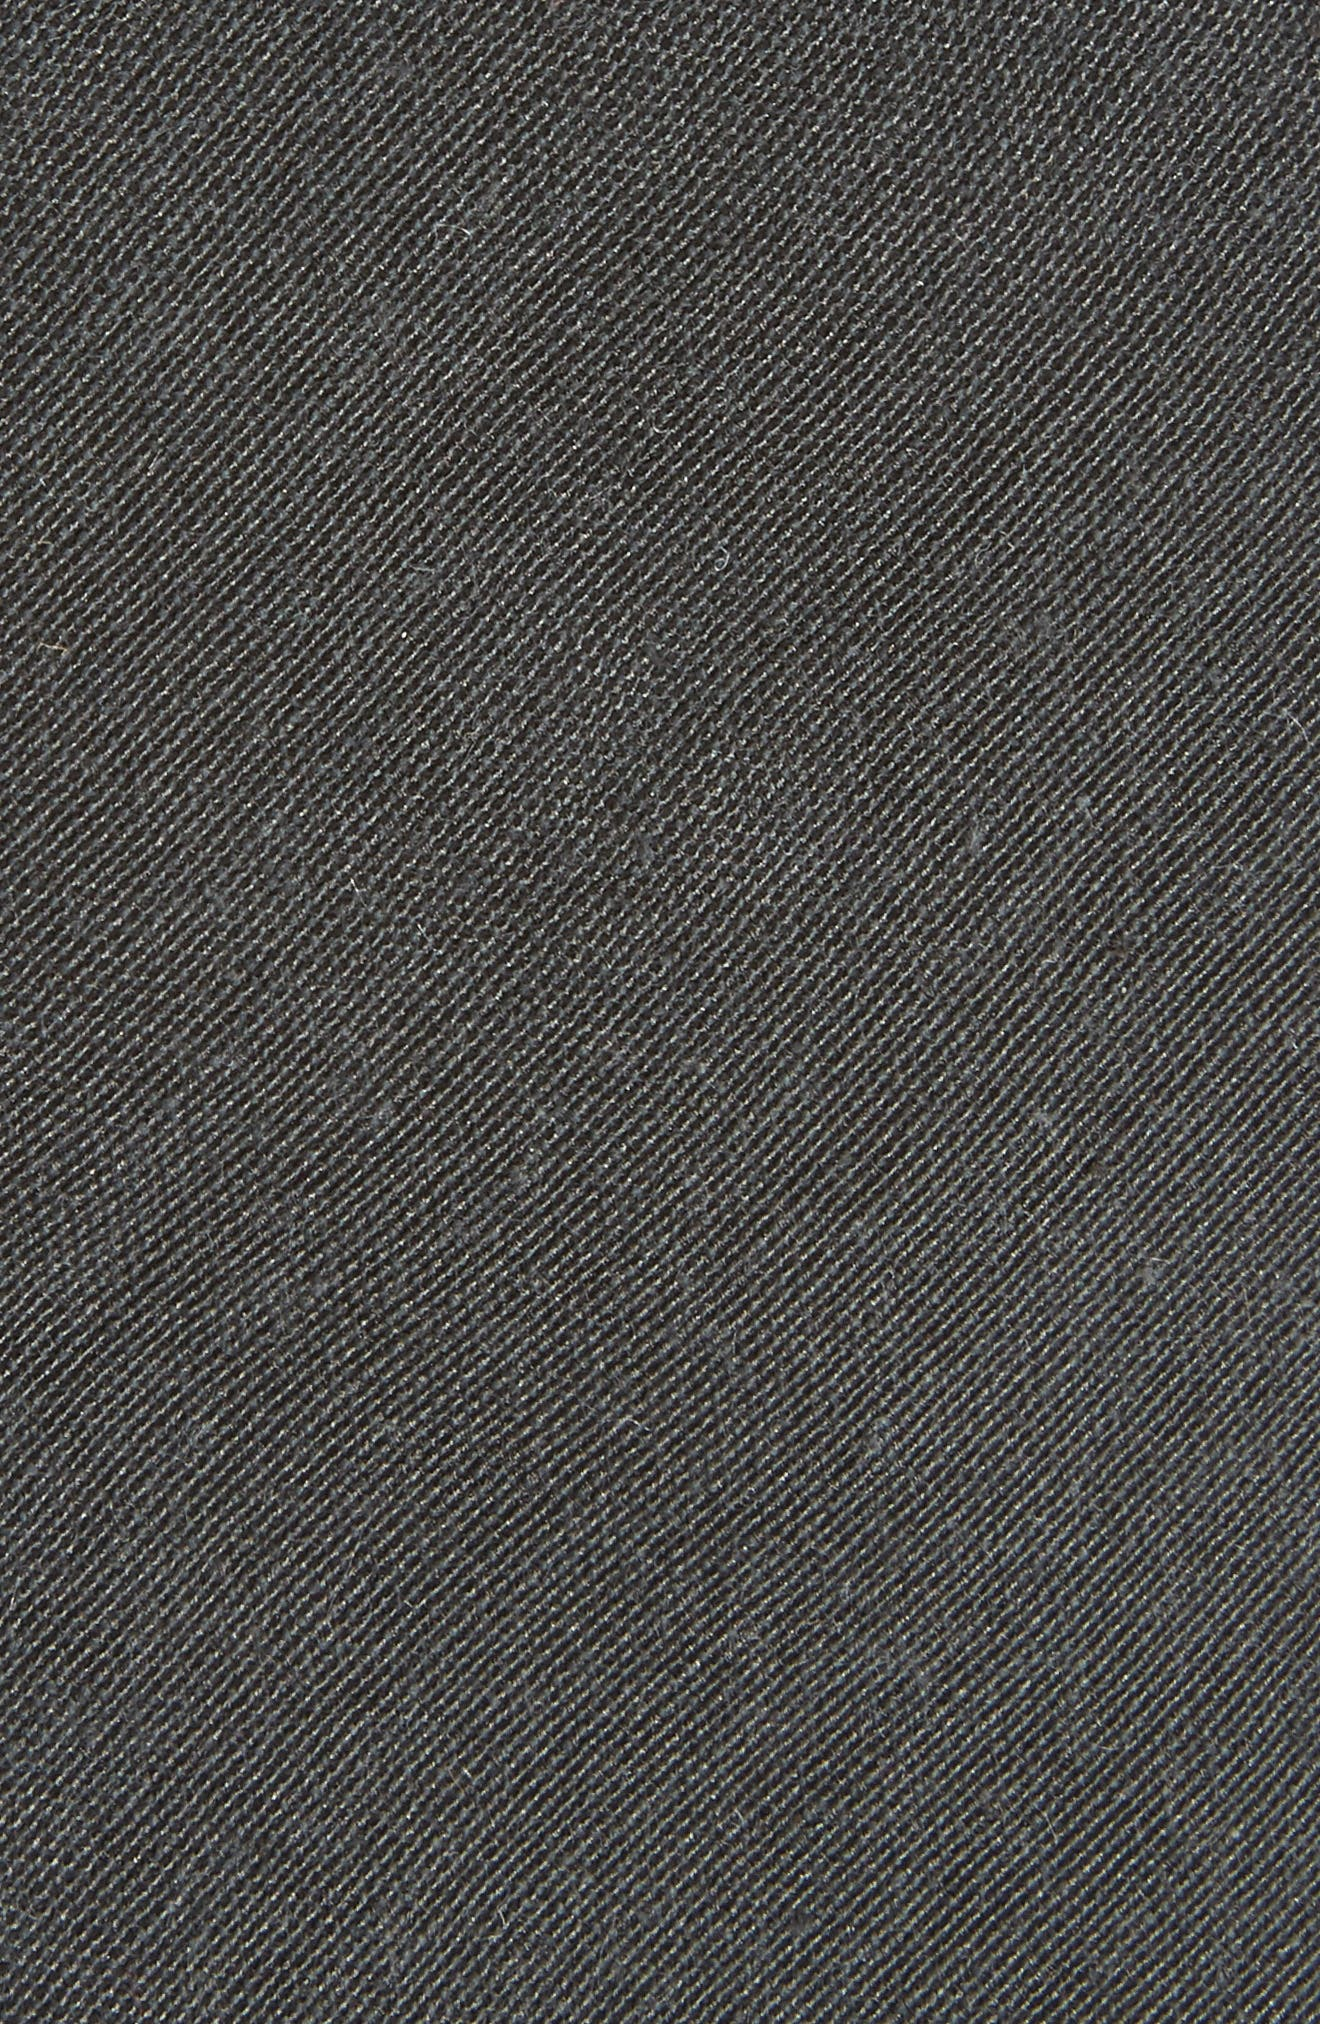 Solid Tie,                             Alternate thumbnail 2, color,                             BLACK